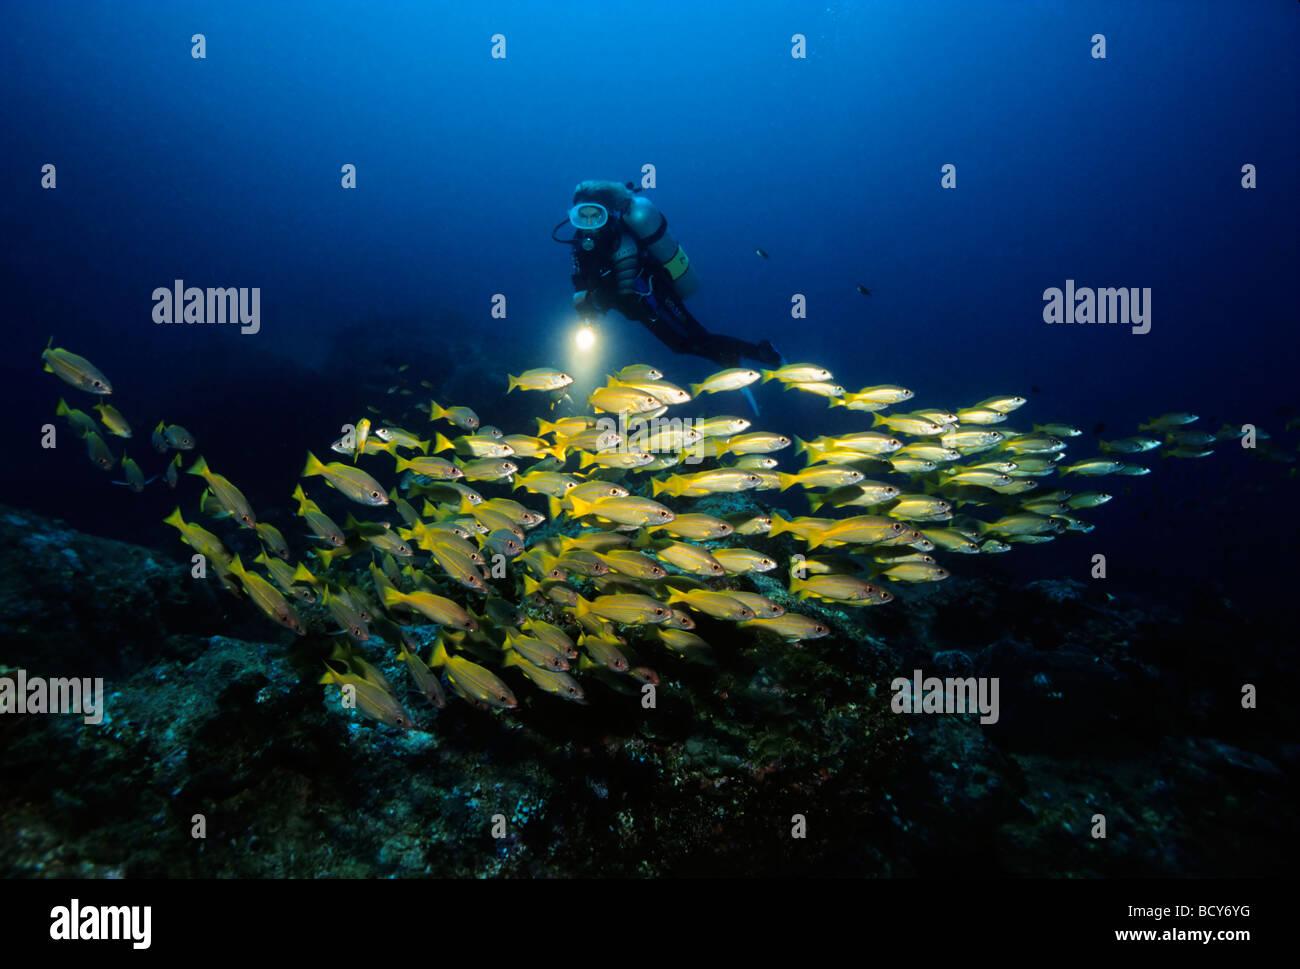 Diver observing school of Goldband Fusiliers (Pterocaesio chrysozona), Similan Islands, Andaman Sea, Thailand, Asia, - Stock Image